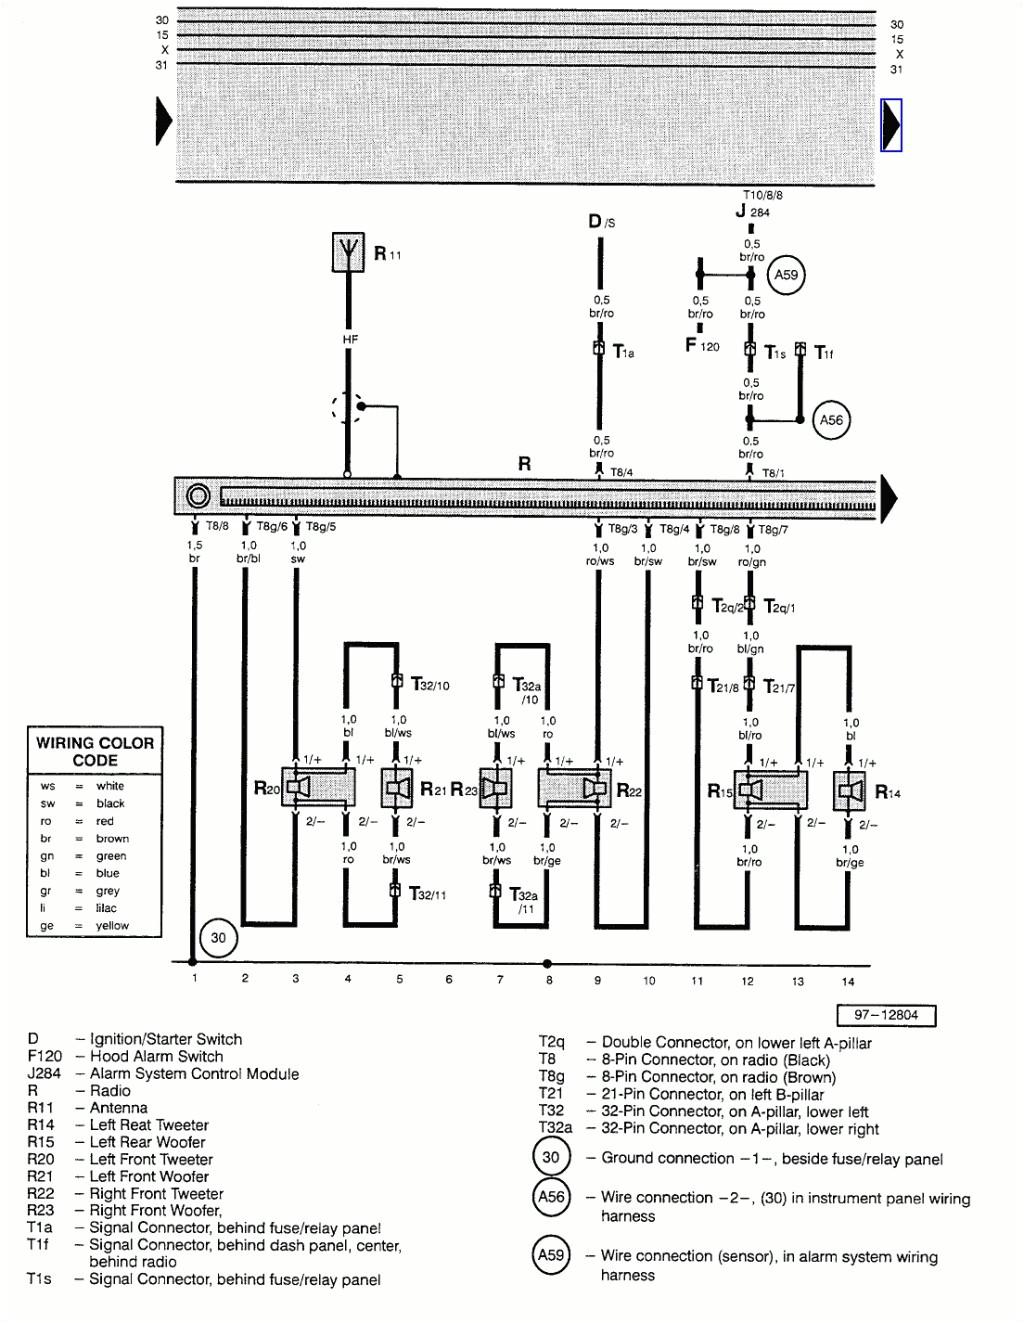 2008 vw wiring diagram wiring diagram rows vw tiguan 2008 wiring diagram 2008 rabbit wiring diagram